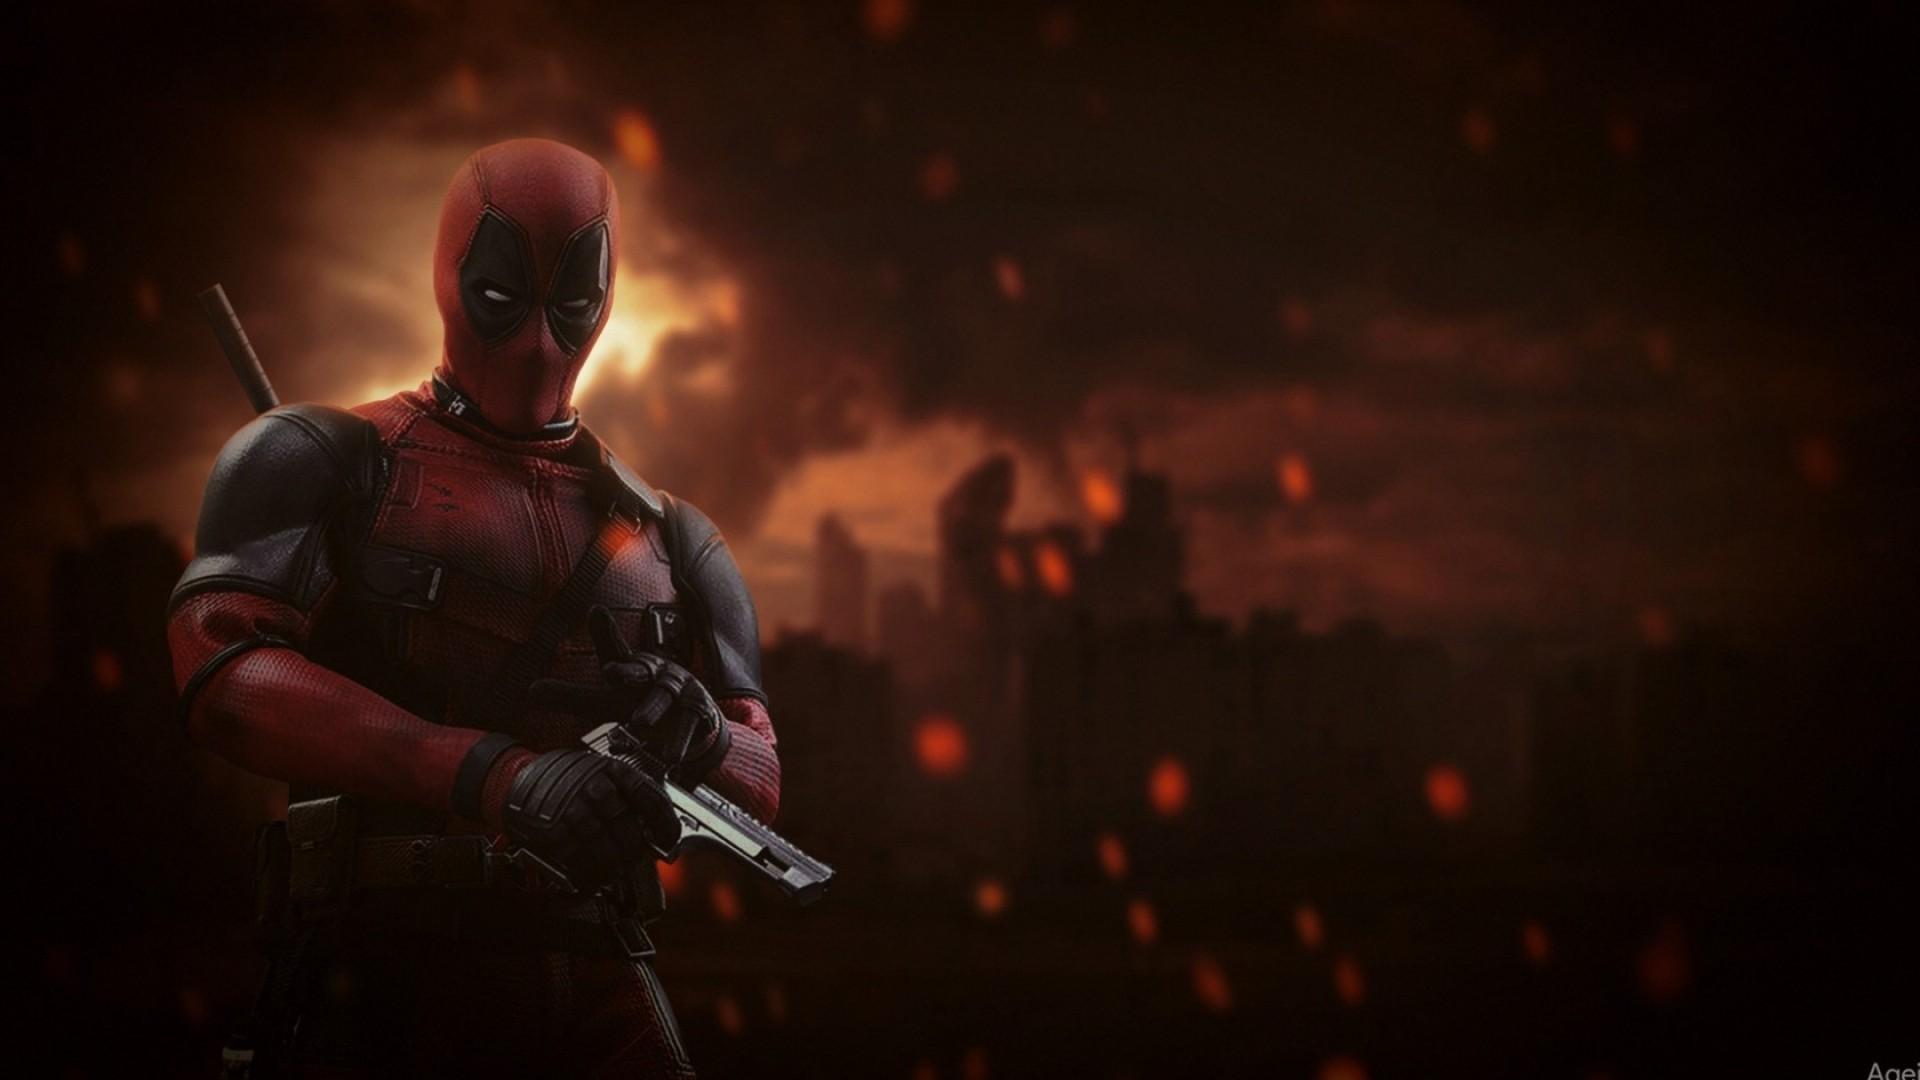 Deadpool Wallpaper Hd 1080p Download Free Stunning Hd